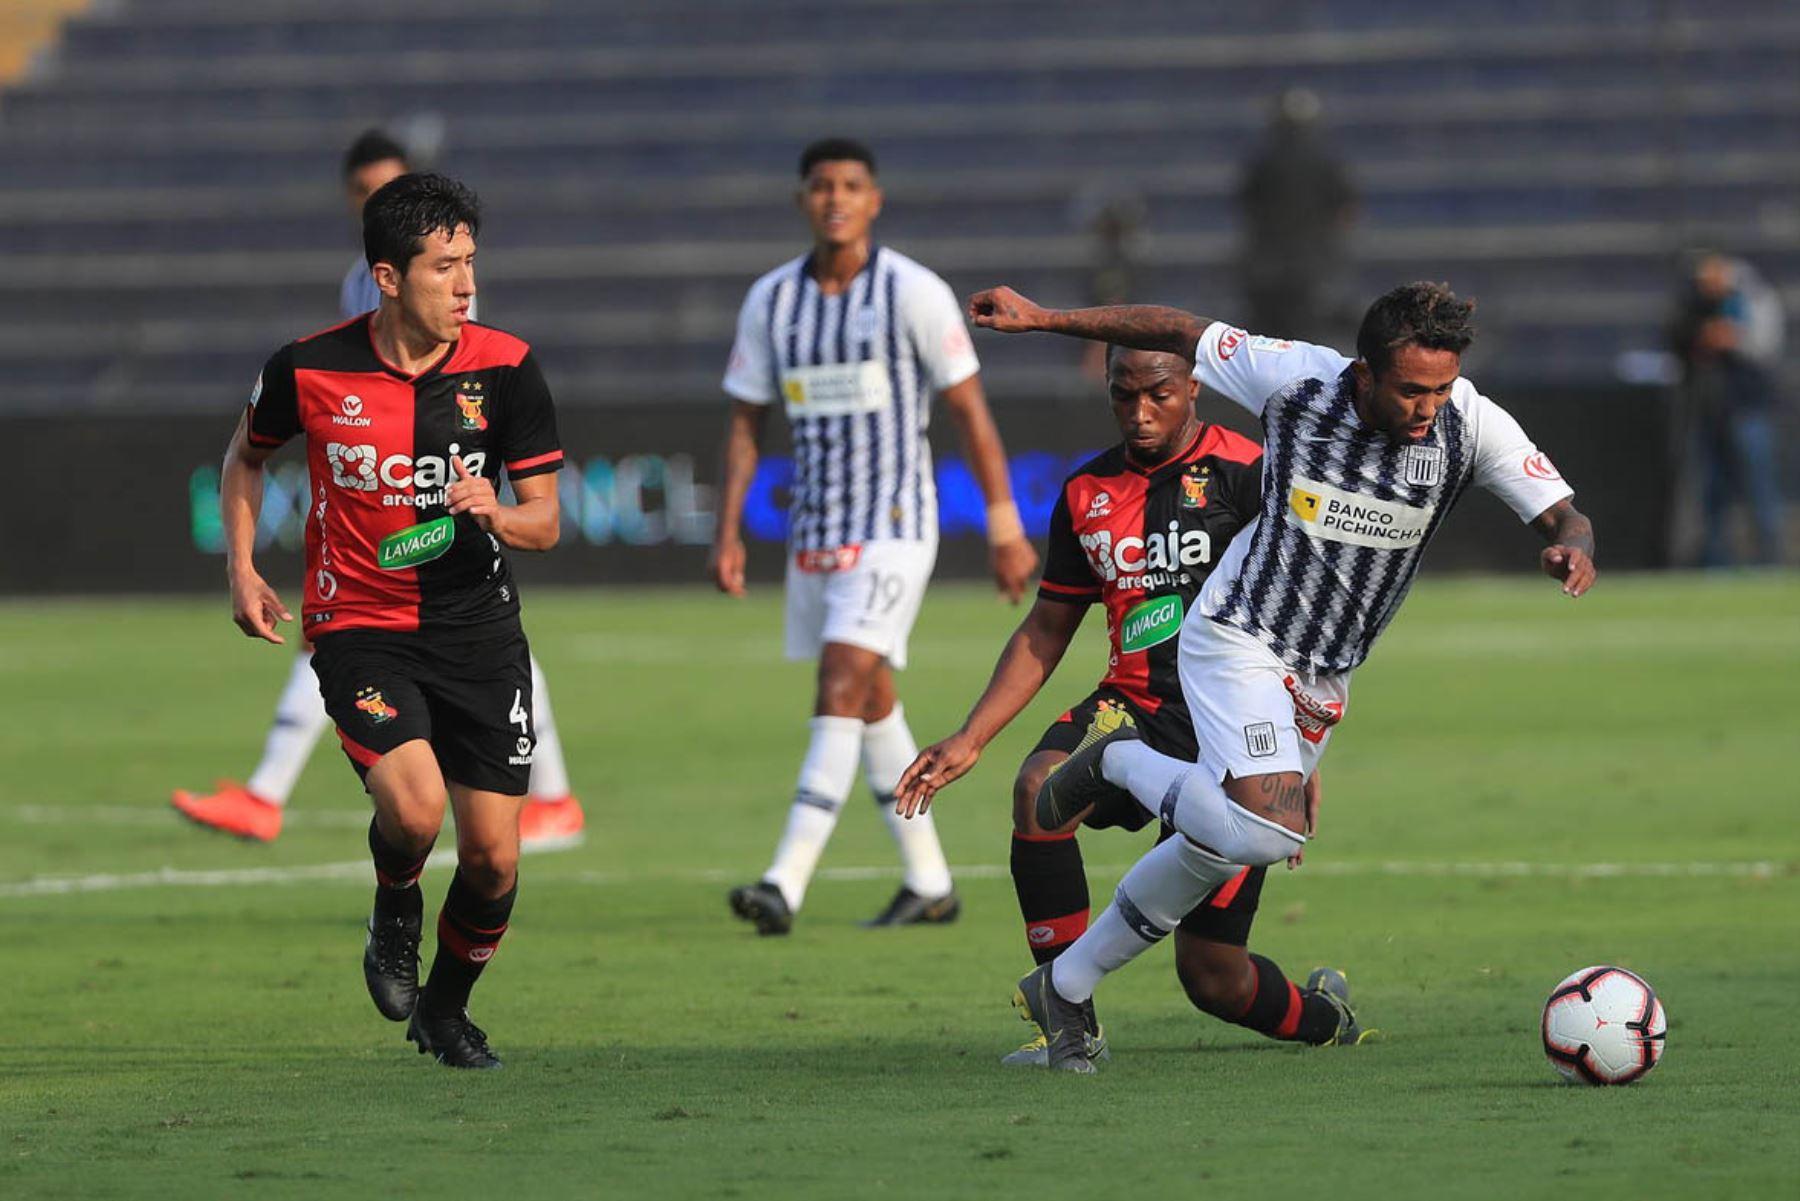 Alianza Lima vs  Melgar se enfrentan por la fecha 13 de la Liga 1 Apertura en el estadio Alejandro Villanueva. Foto: ANDINA/Juan Carlos Guzmán